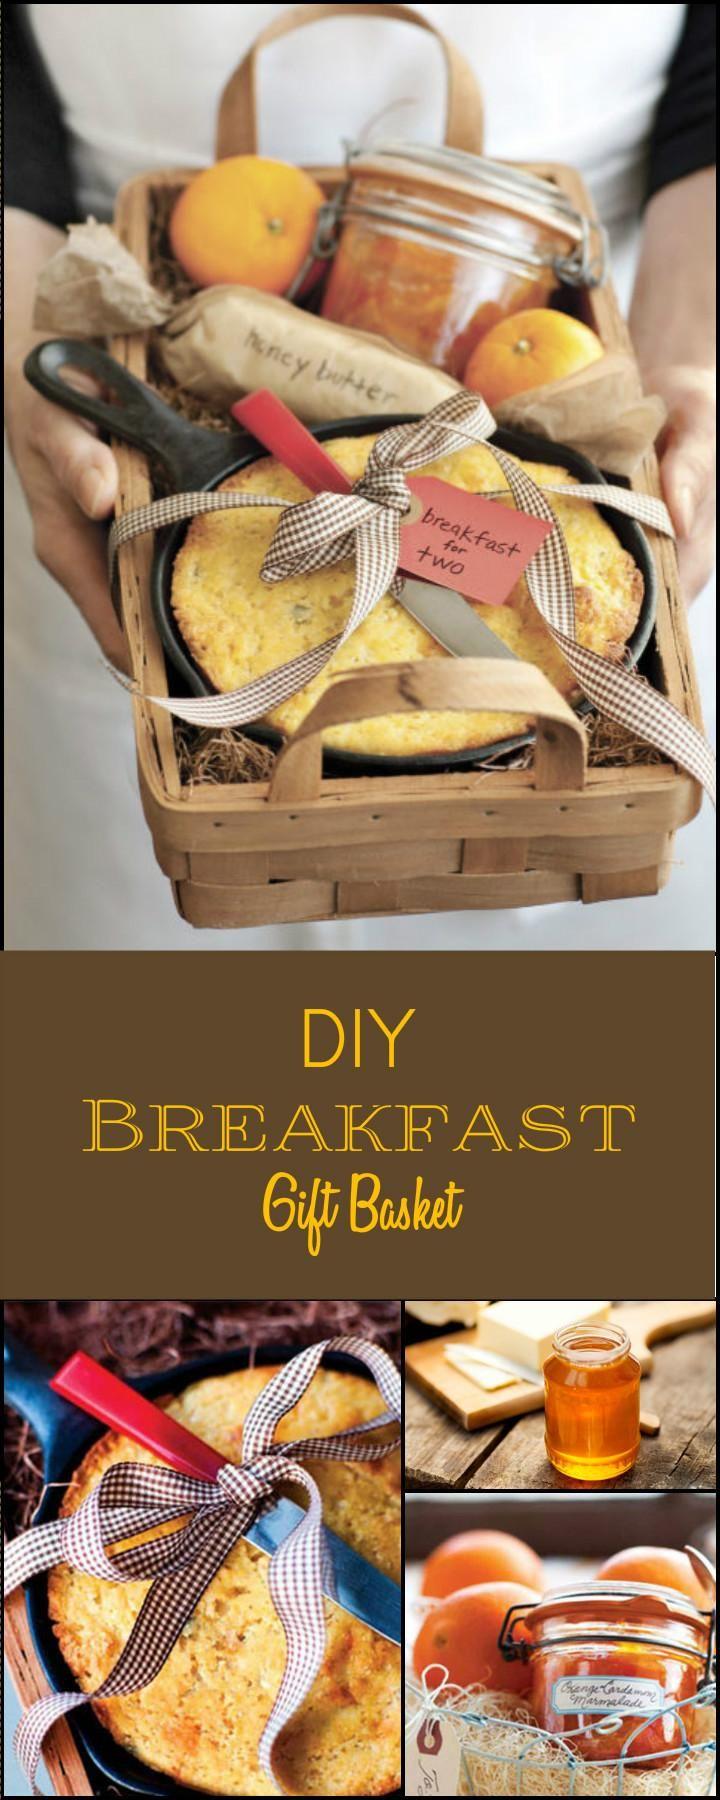 Cool Self-MadeBreakfastGiftBasket - 70+ Inexpensive DIY Gift Basket Ideas - DIY Gifts - Page 6 of 14 - DIY & Crafts